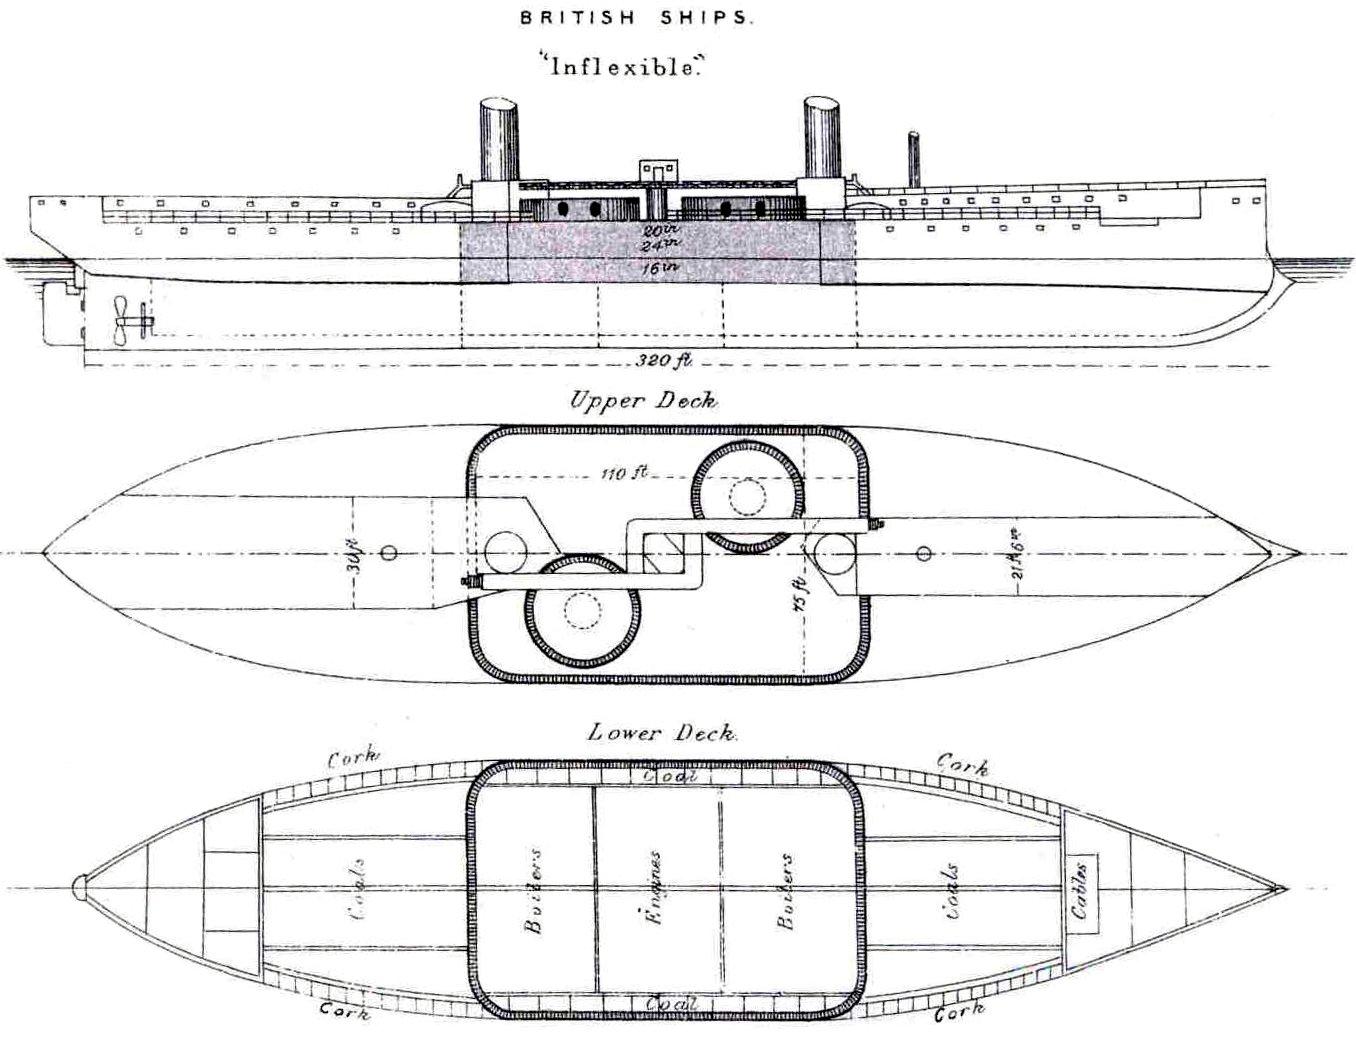 hms_inflexible_diagrams_brasseys_1888.jpg